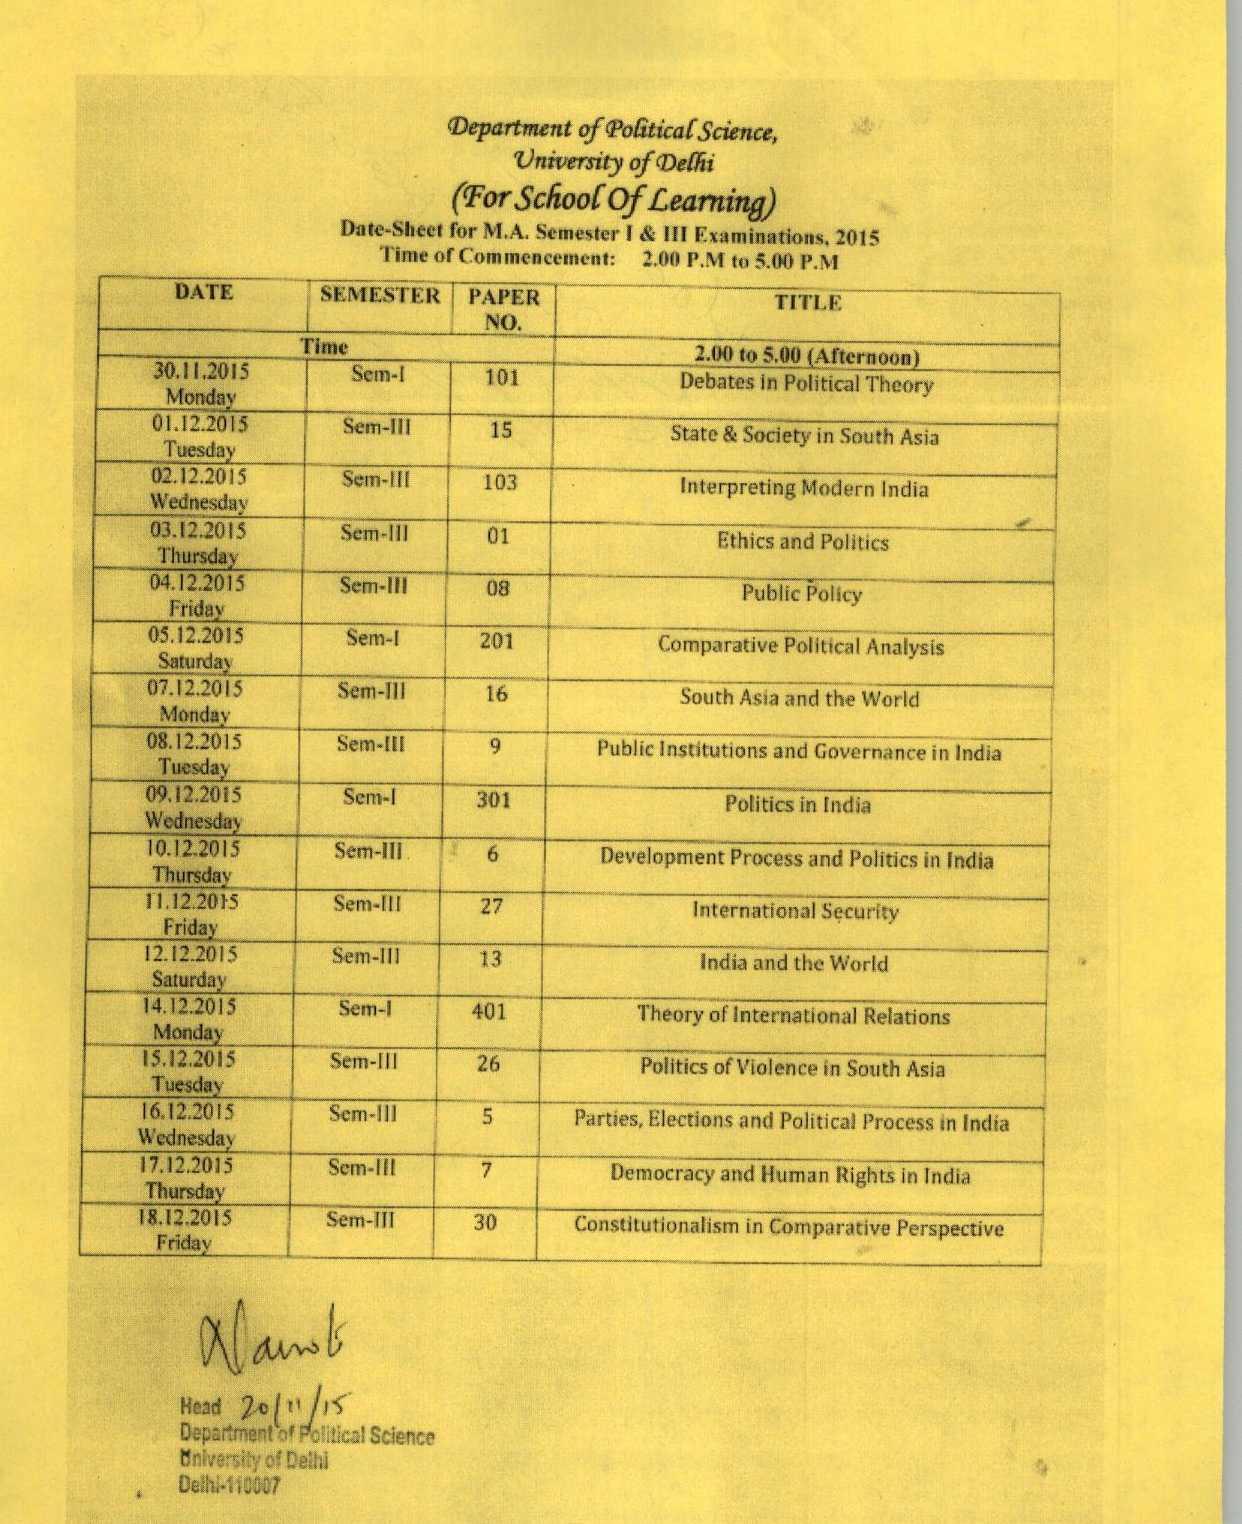 sol date sheet